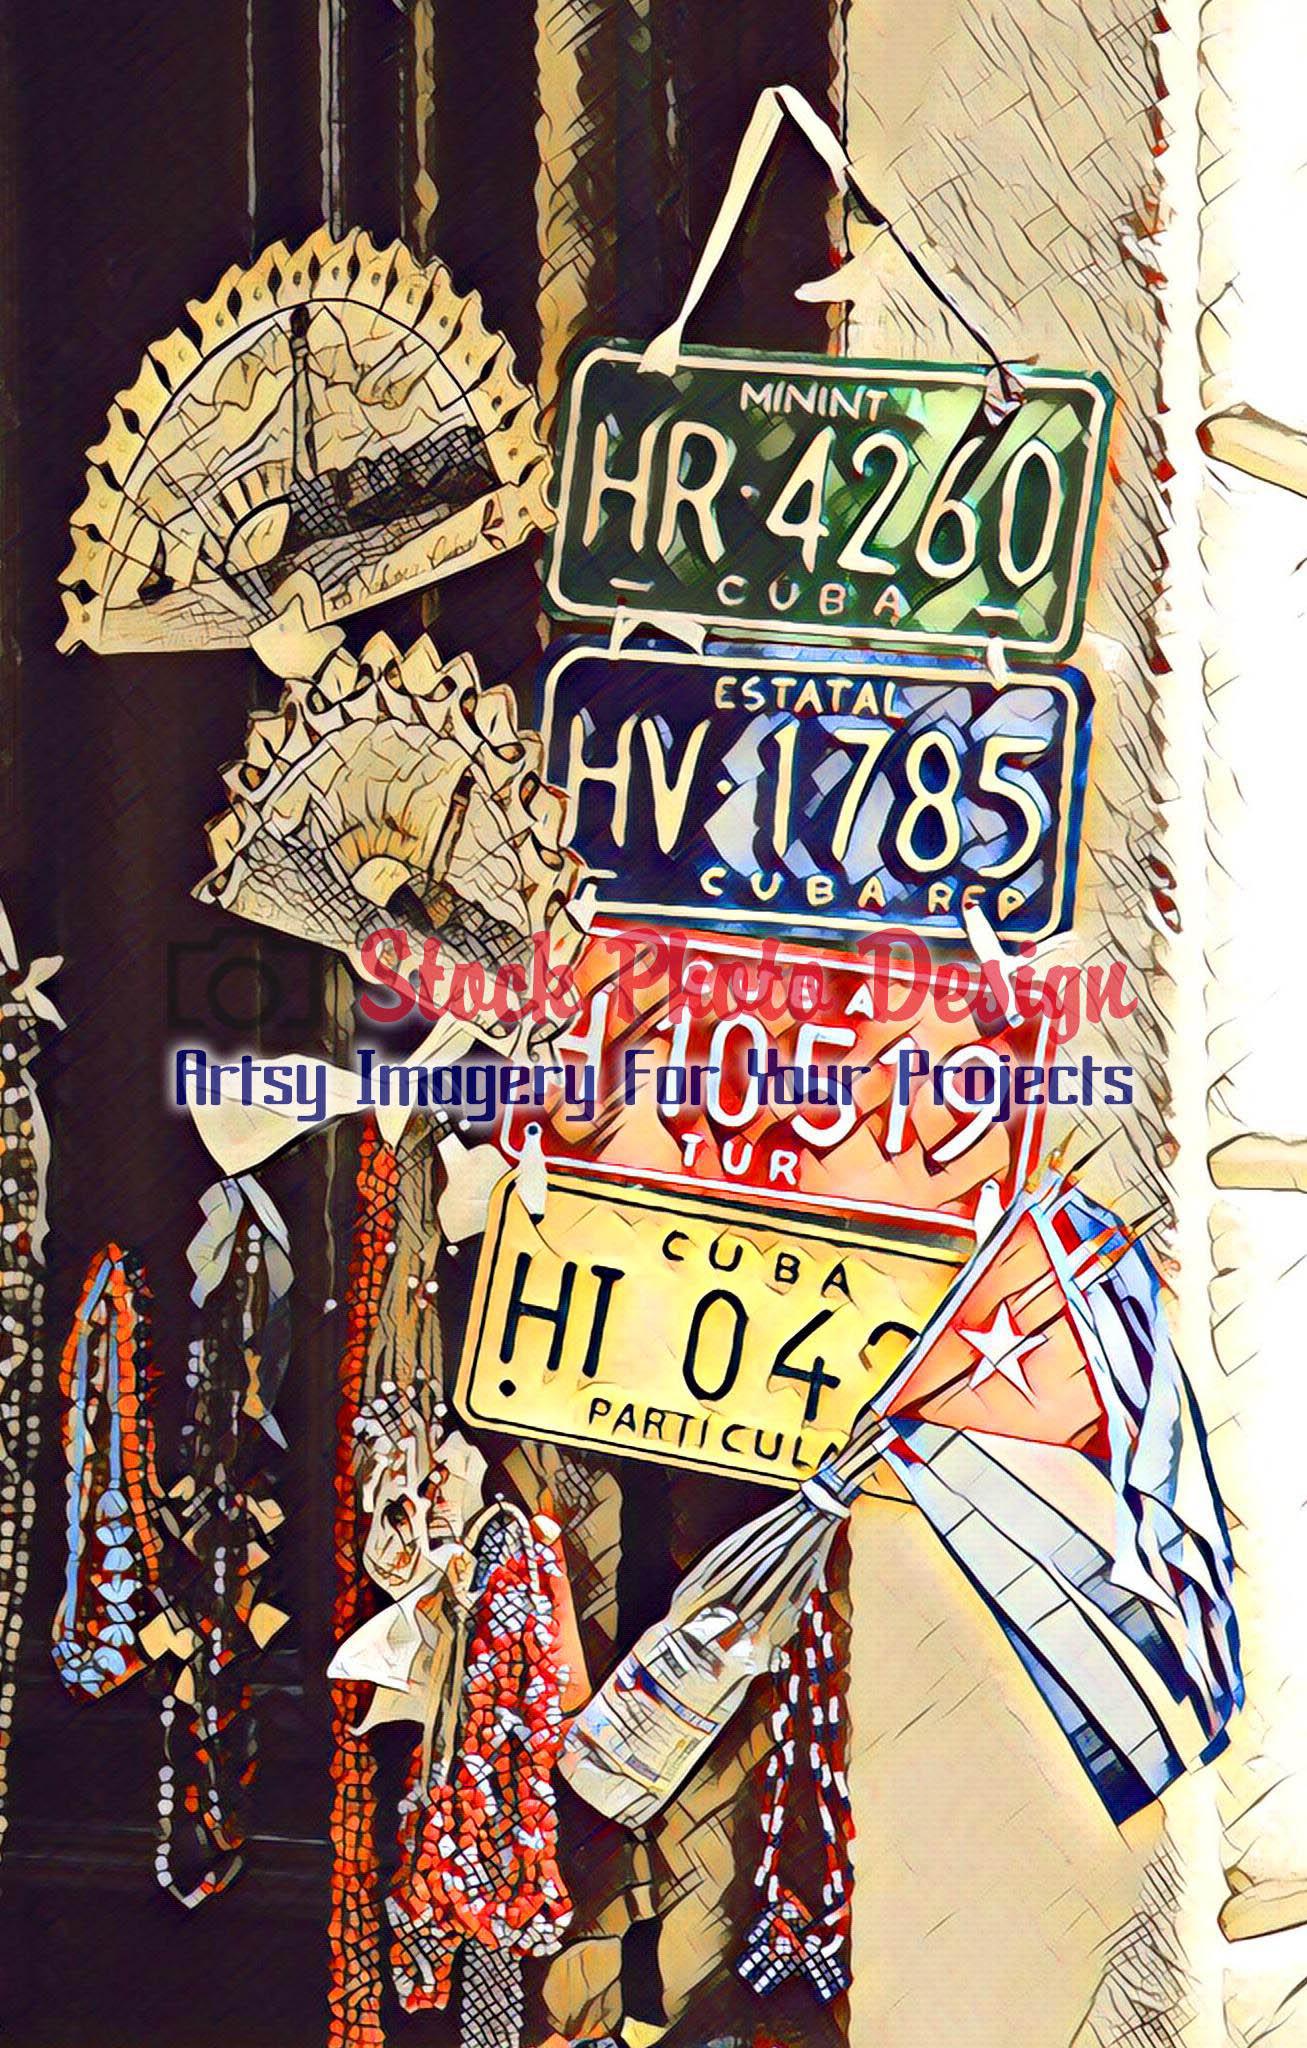 Cuban Car Plates